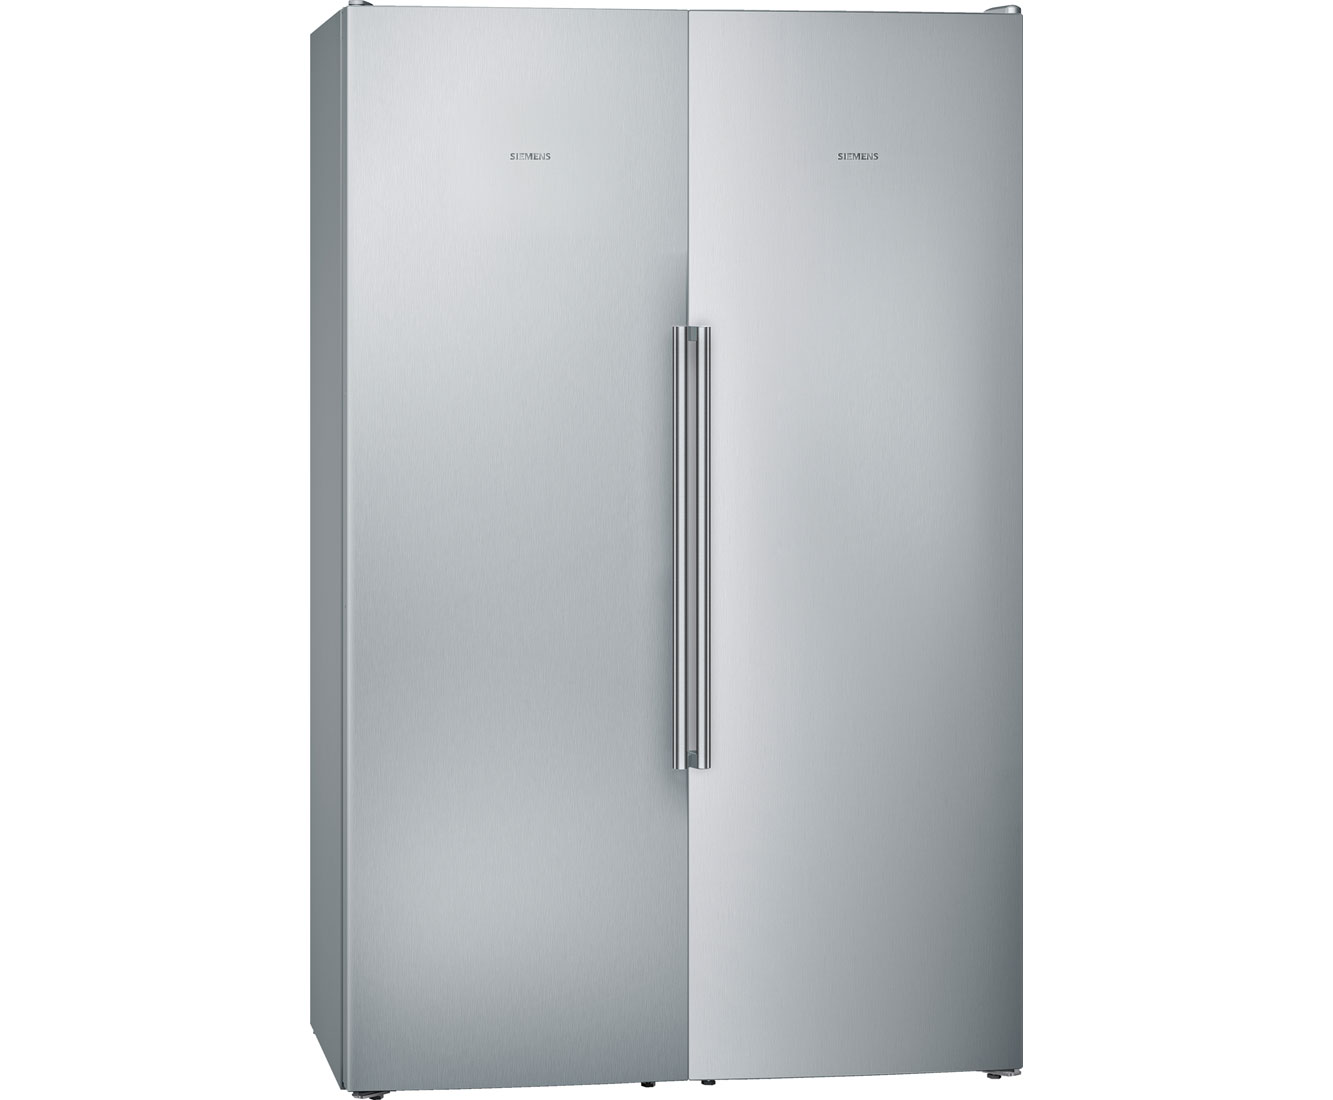 Smeg Kühlschrank Knacken : Smeg kühlschrank laute geräusche siemens kühlschrank macht